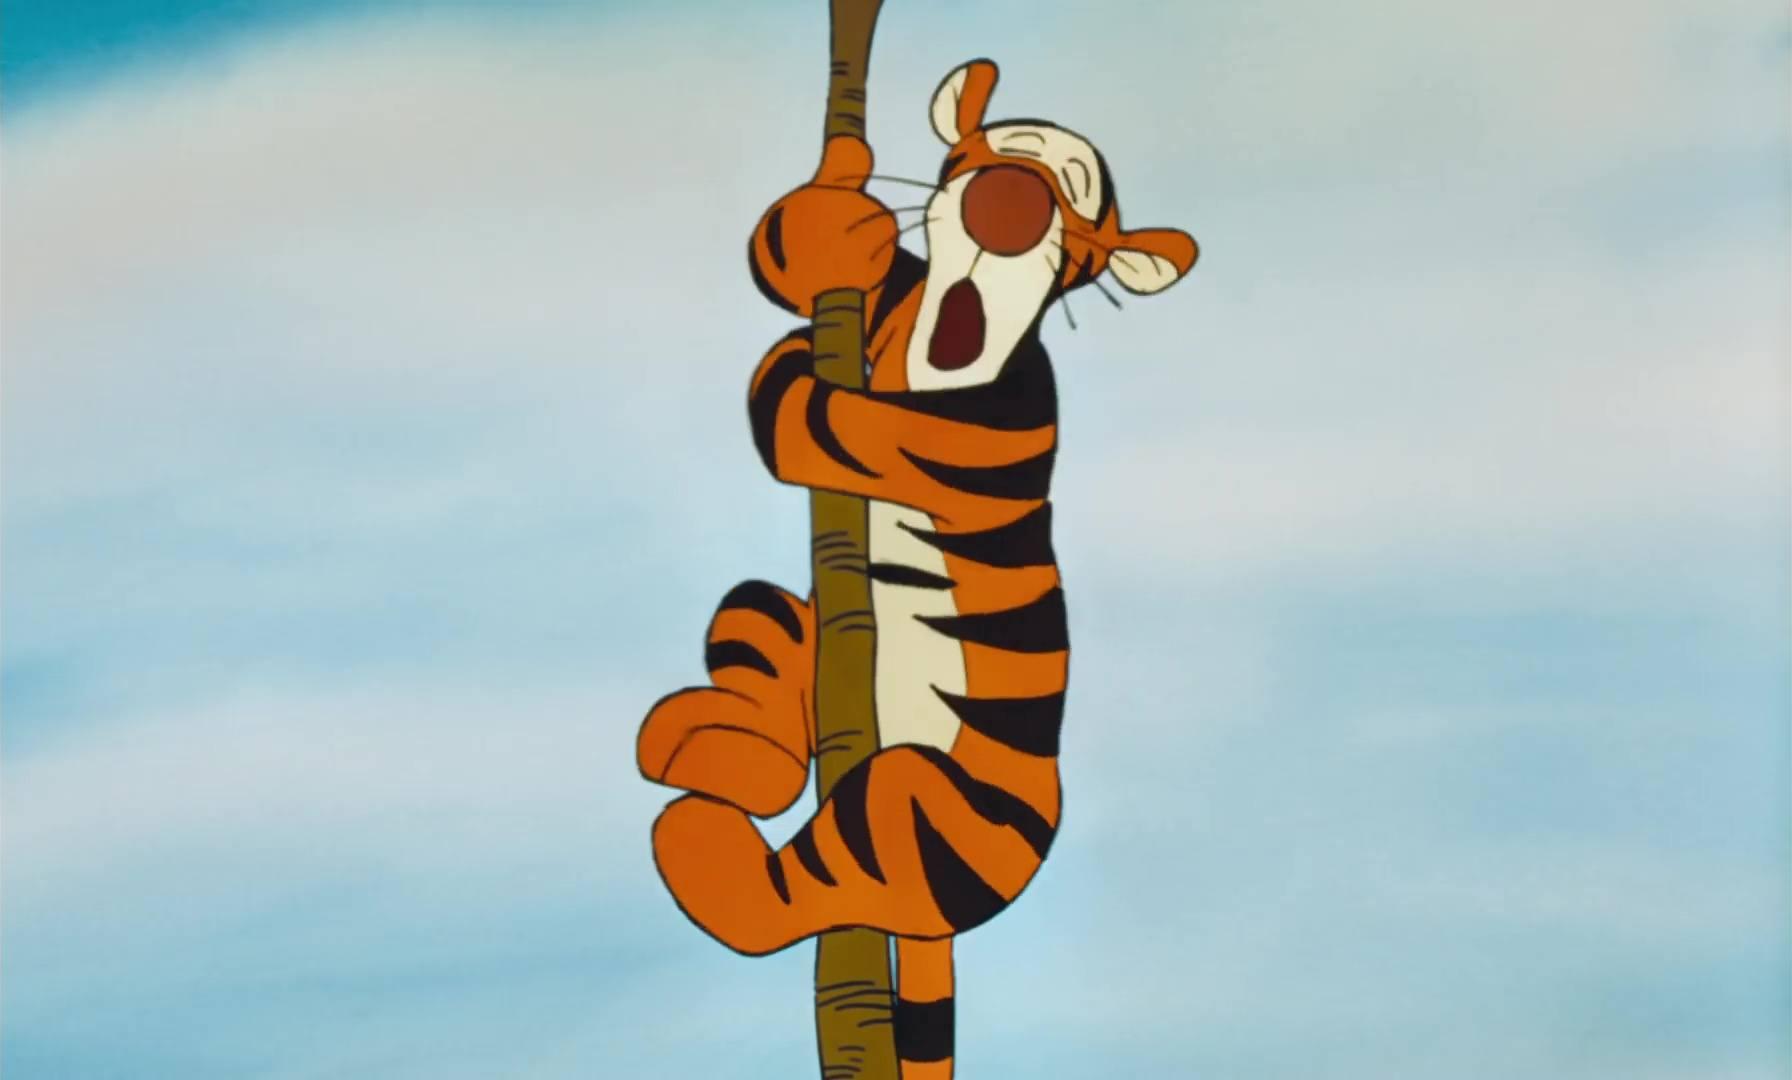 image winnie ourson tigre fou bounciest tiger disney